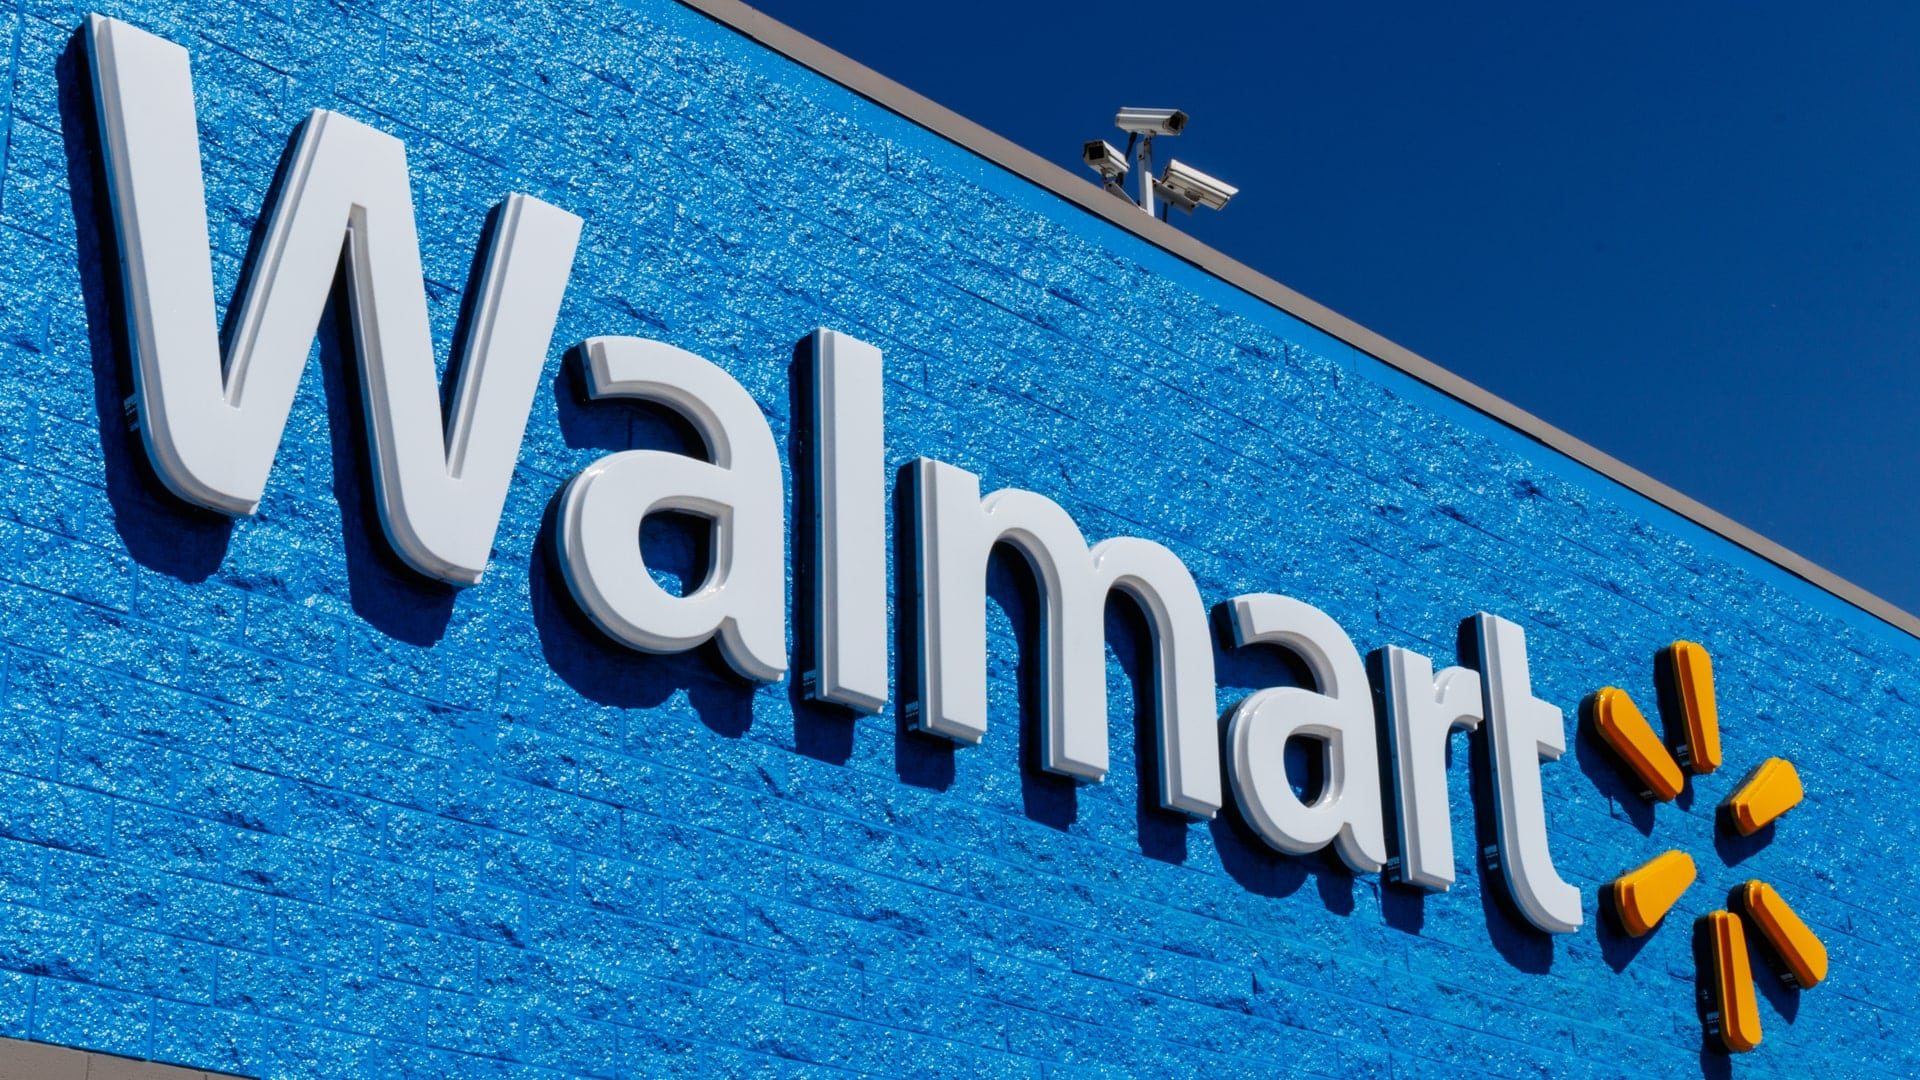 Walmart secretly activated 200 BTC ATMs